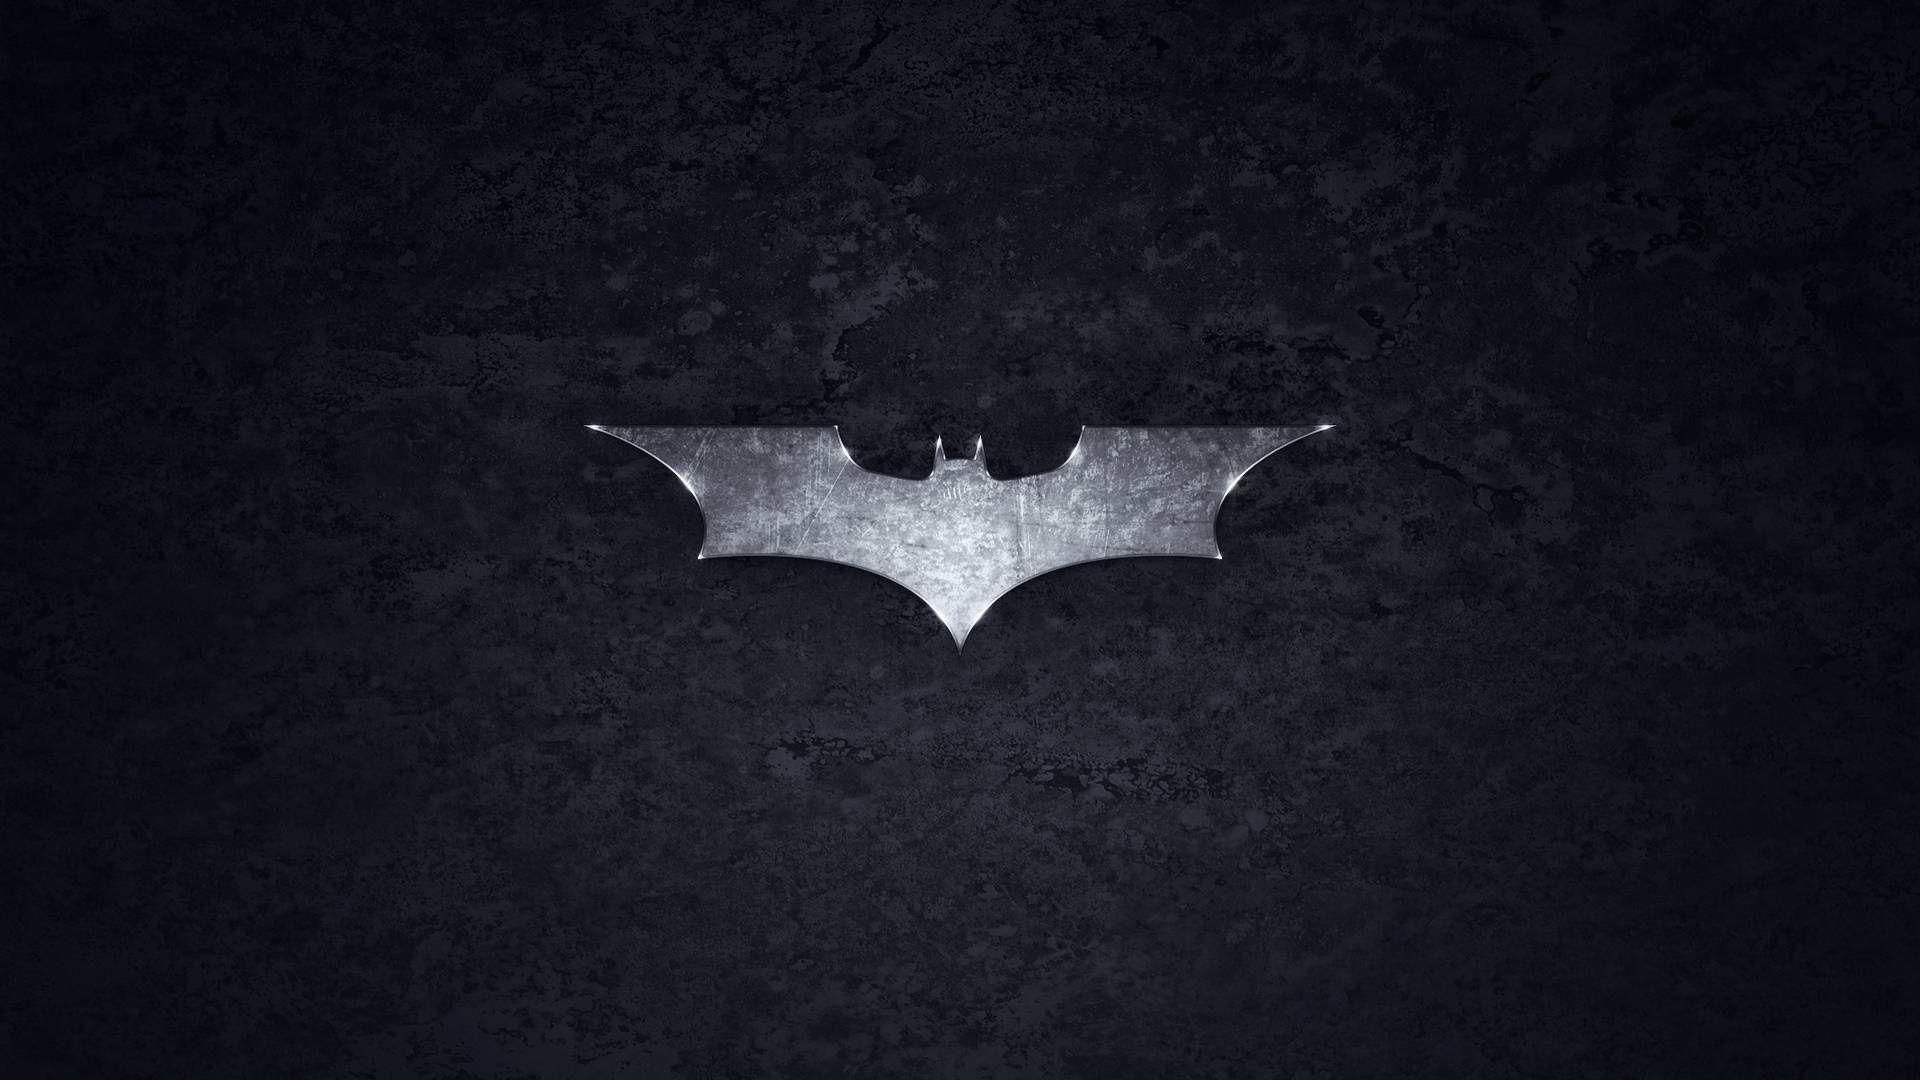 Hd wallpaper logo - Batman Black Logo Hd Widescreen Wallpaper